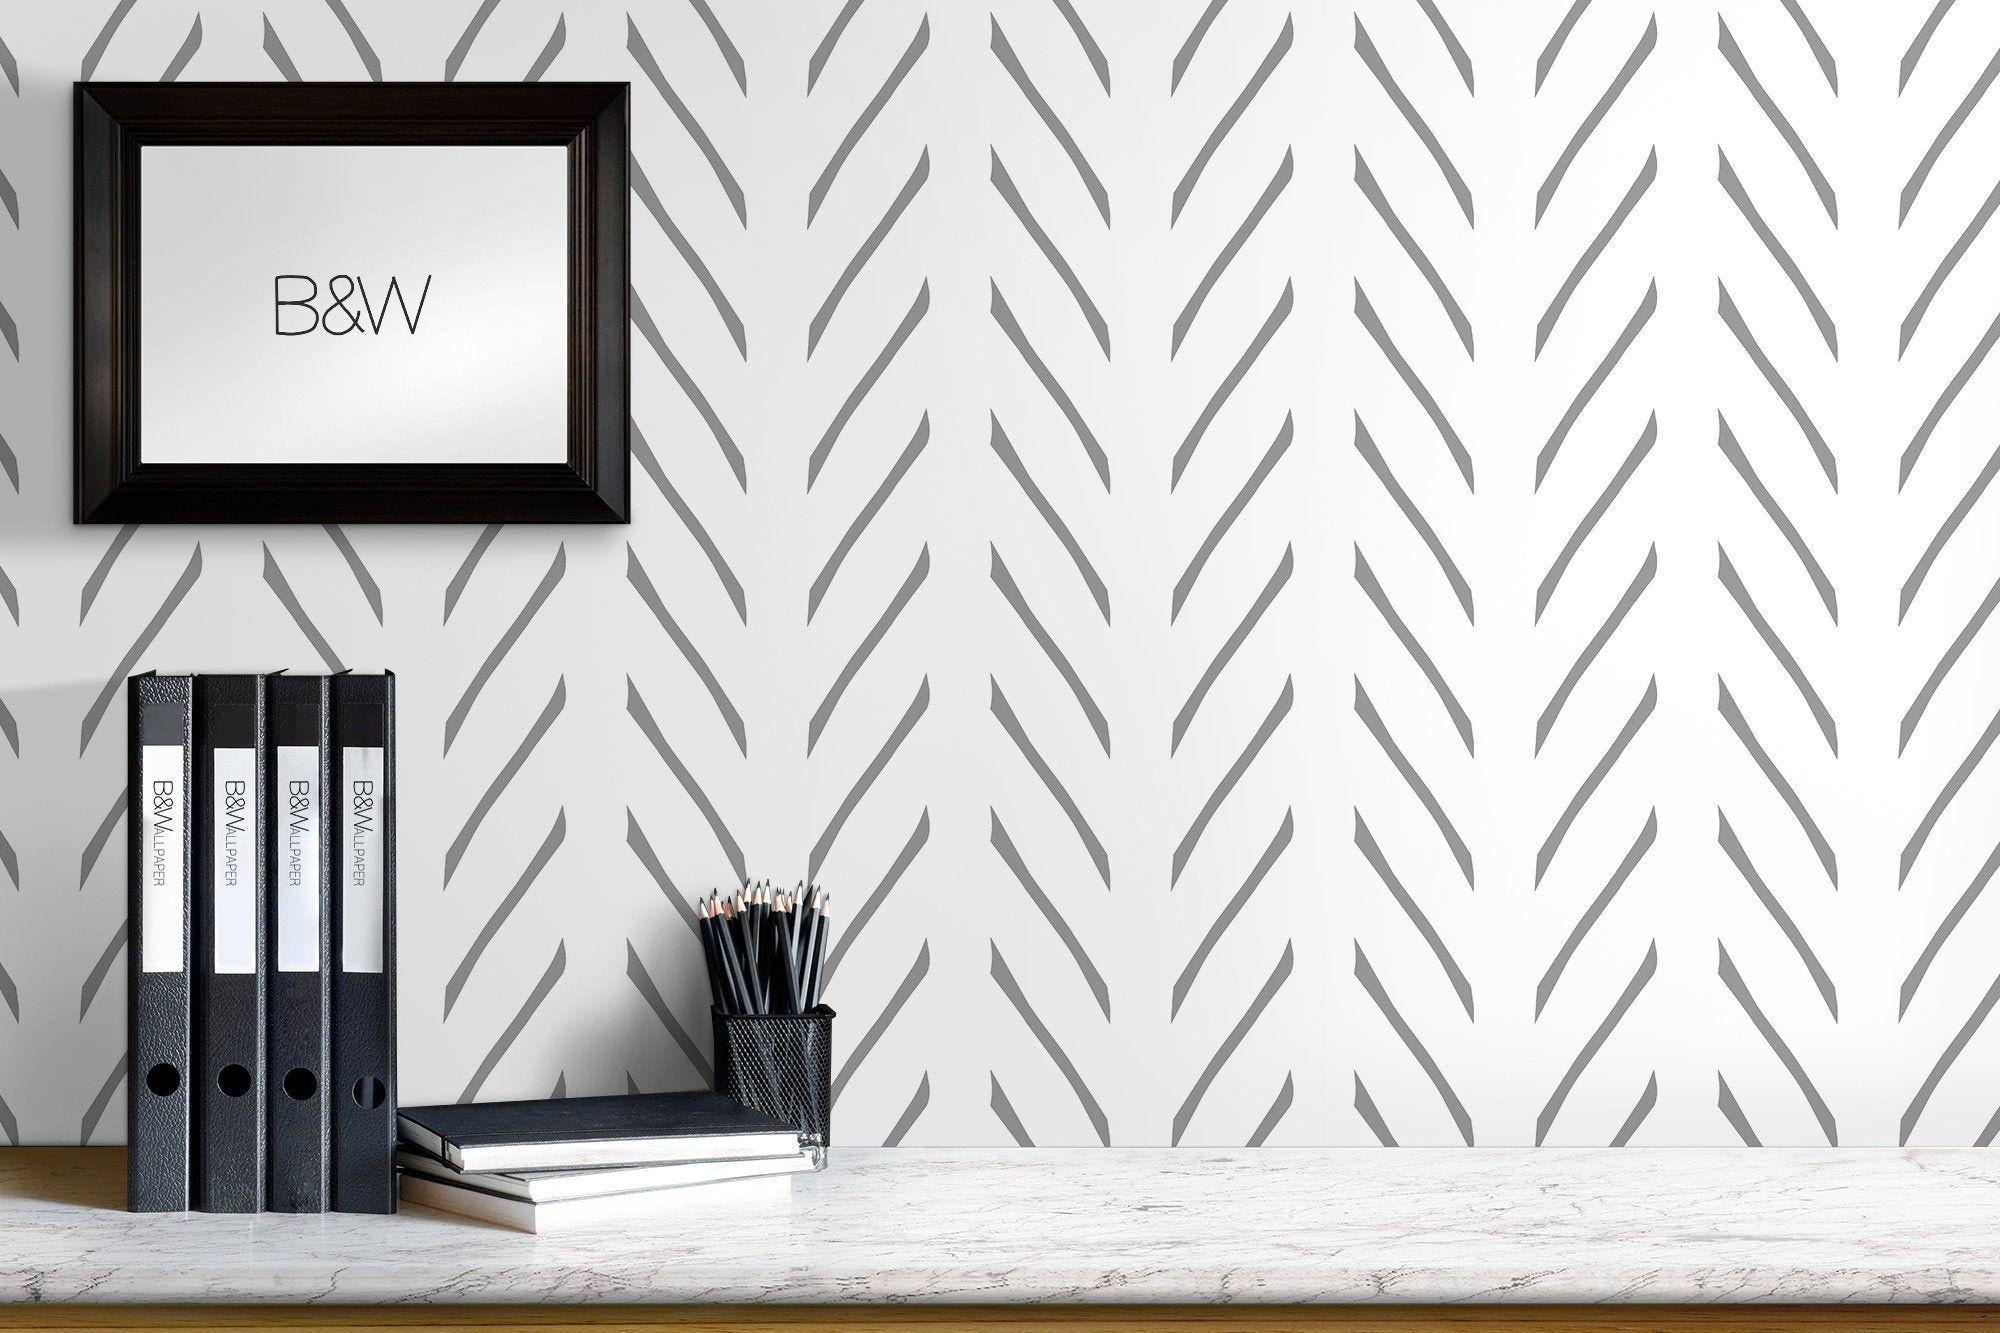 Peel And Stick Herringbone Wallpaper Black And White Wall Etsy Geometric Stripe Wallpaper Herringbone Wallpaper White Wall Decor